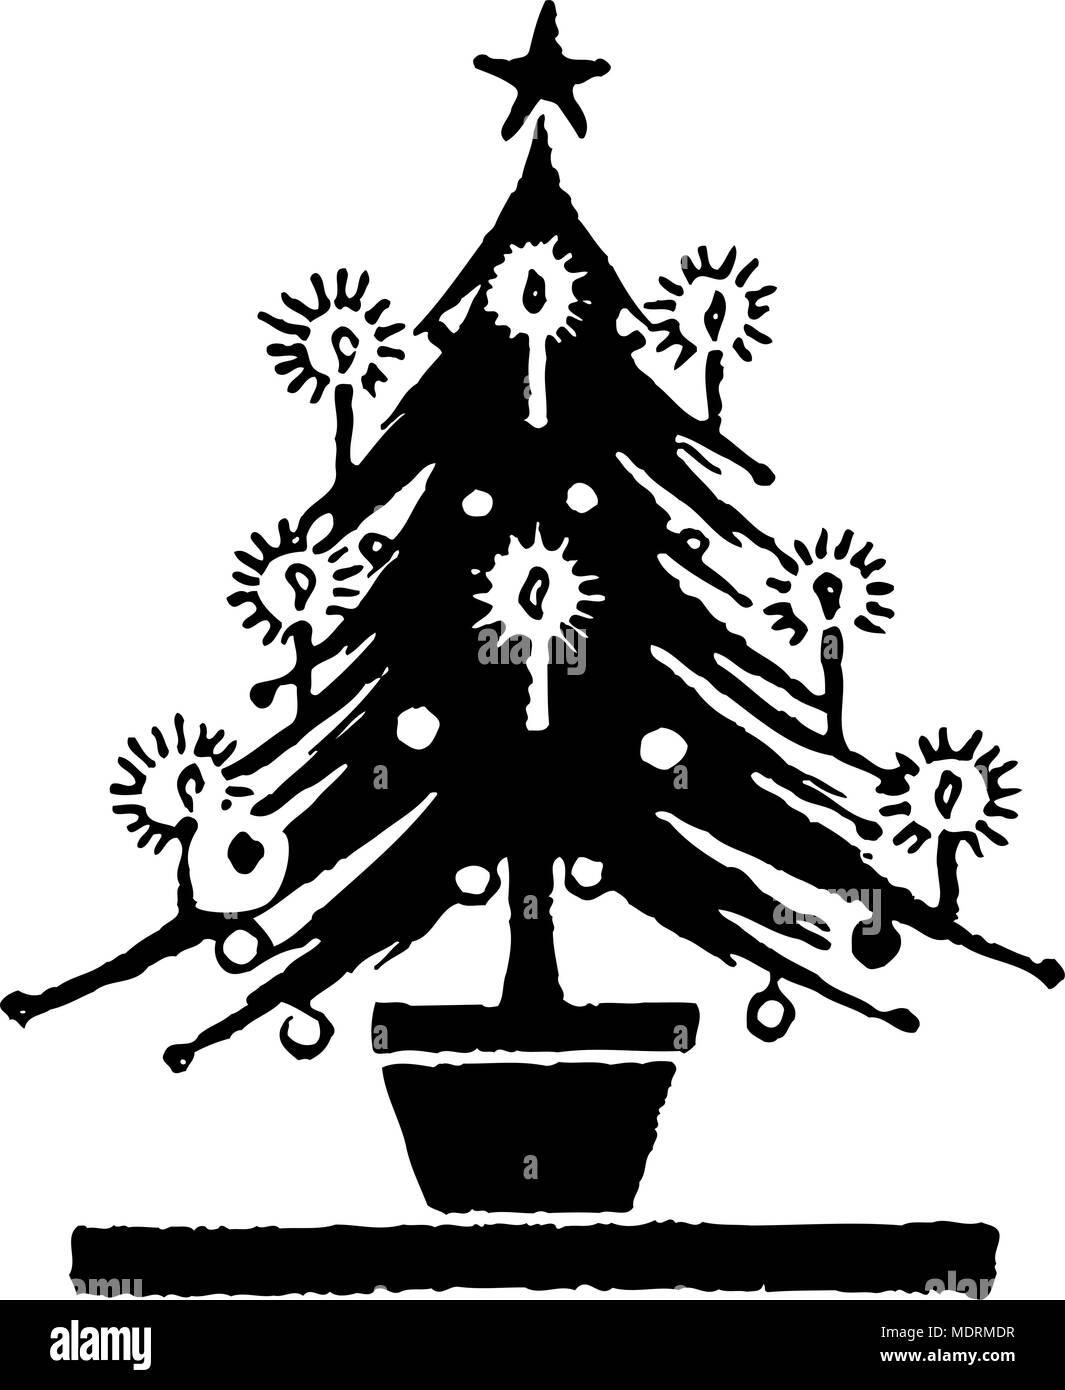 Clipart Tannenbaum Schwarz Weiß.Scalable Tree Stockfotos Scalable Tree Bilder Alamy